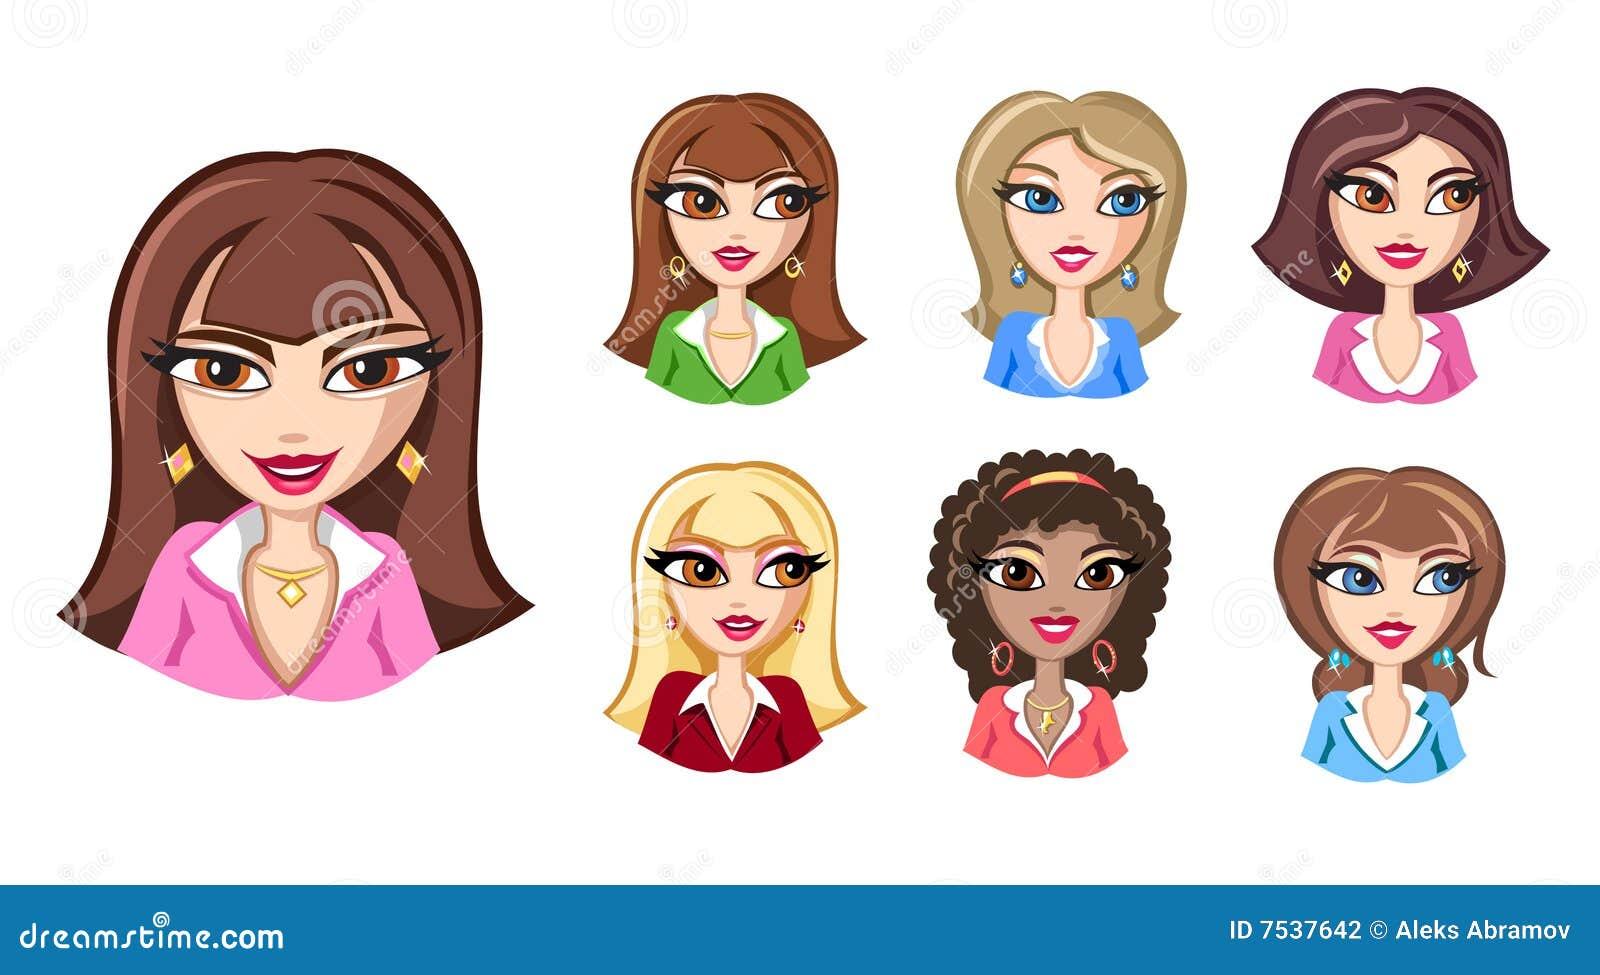 Girls Avatars Stock Photography - Image: 7537642   1300 x 809 jpeg 112kB